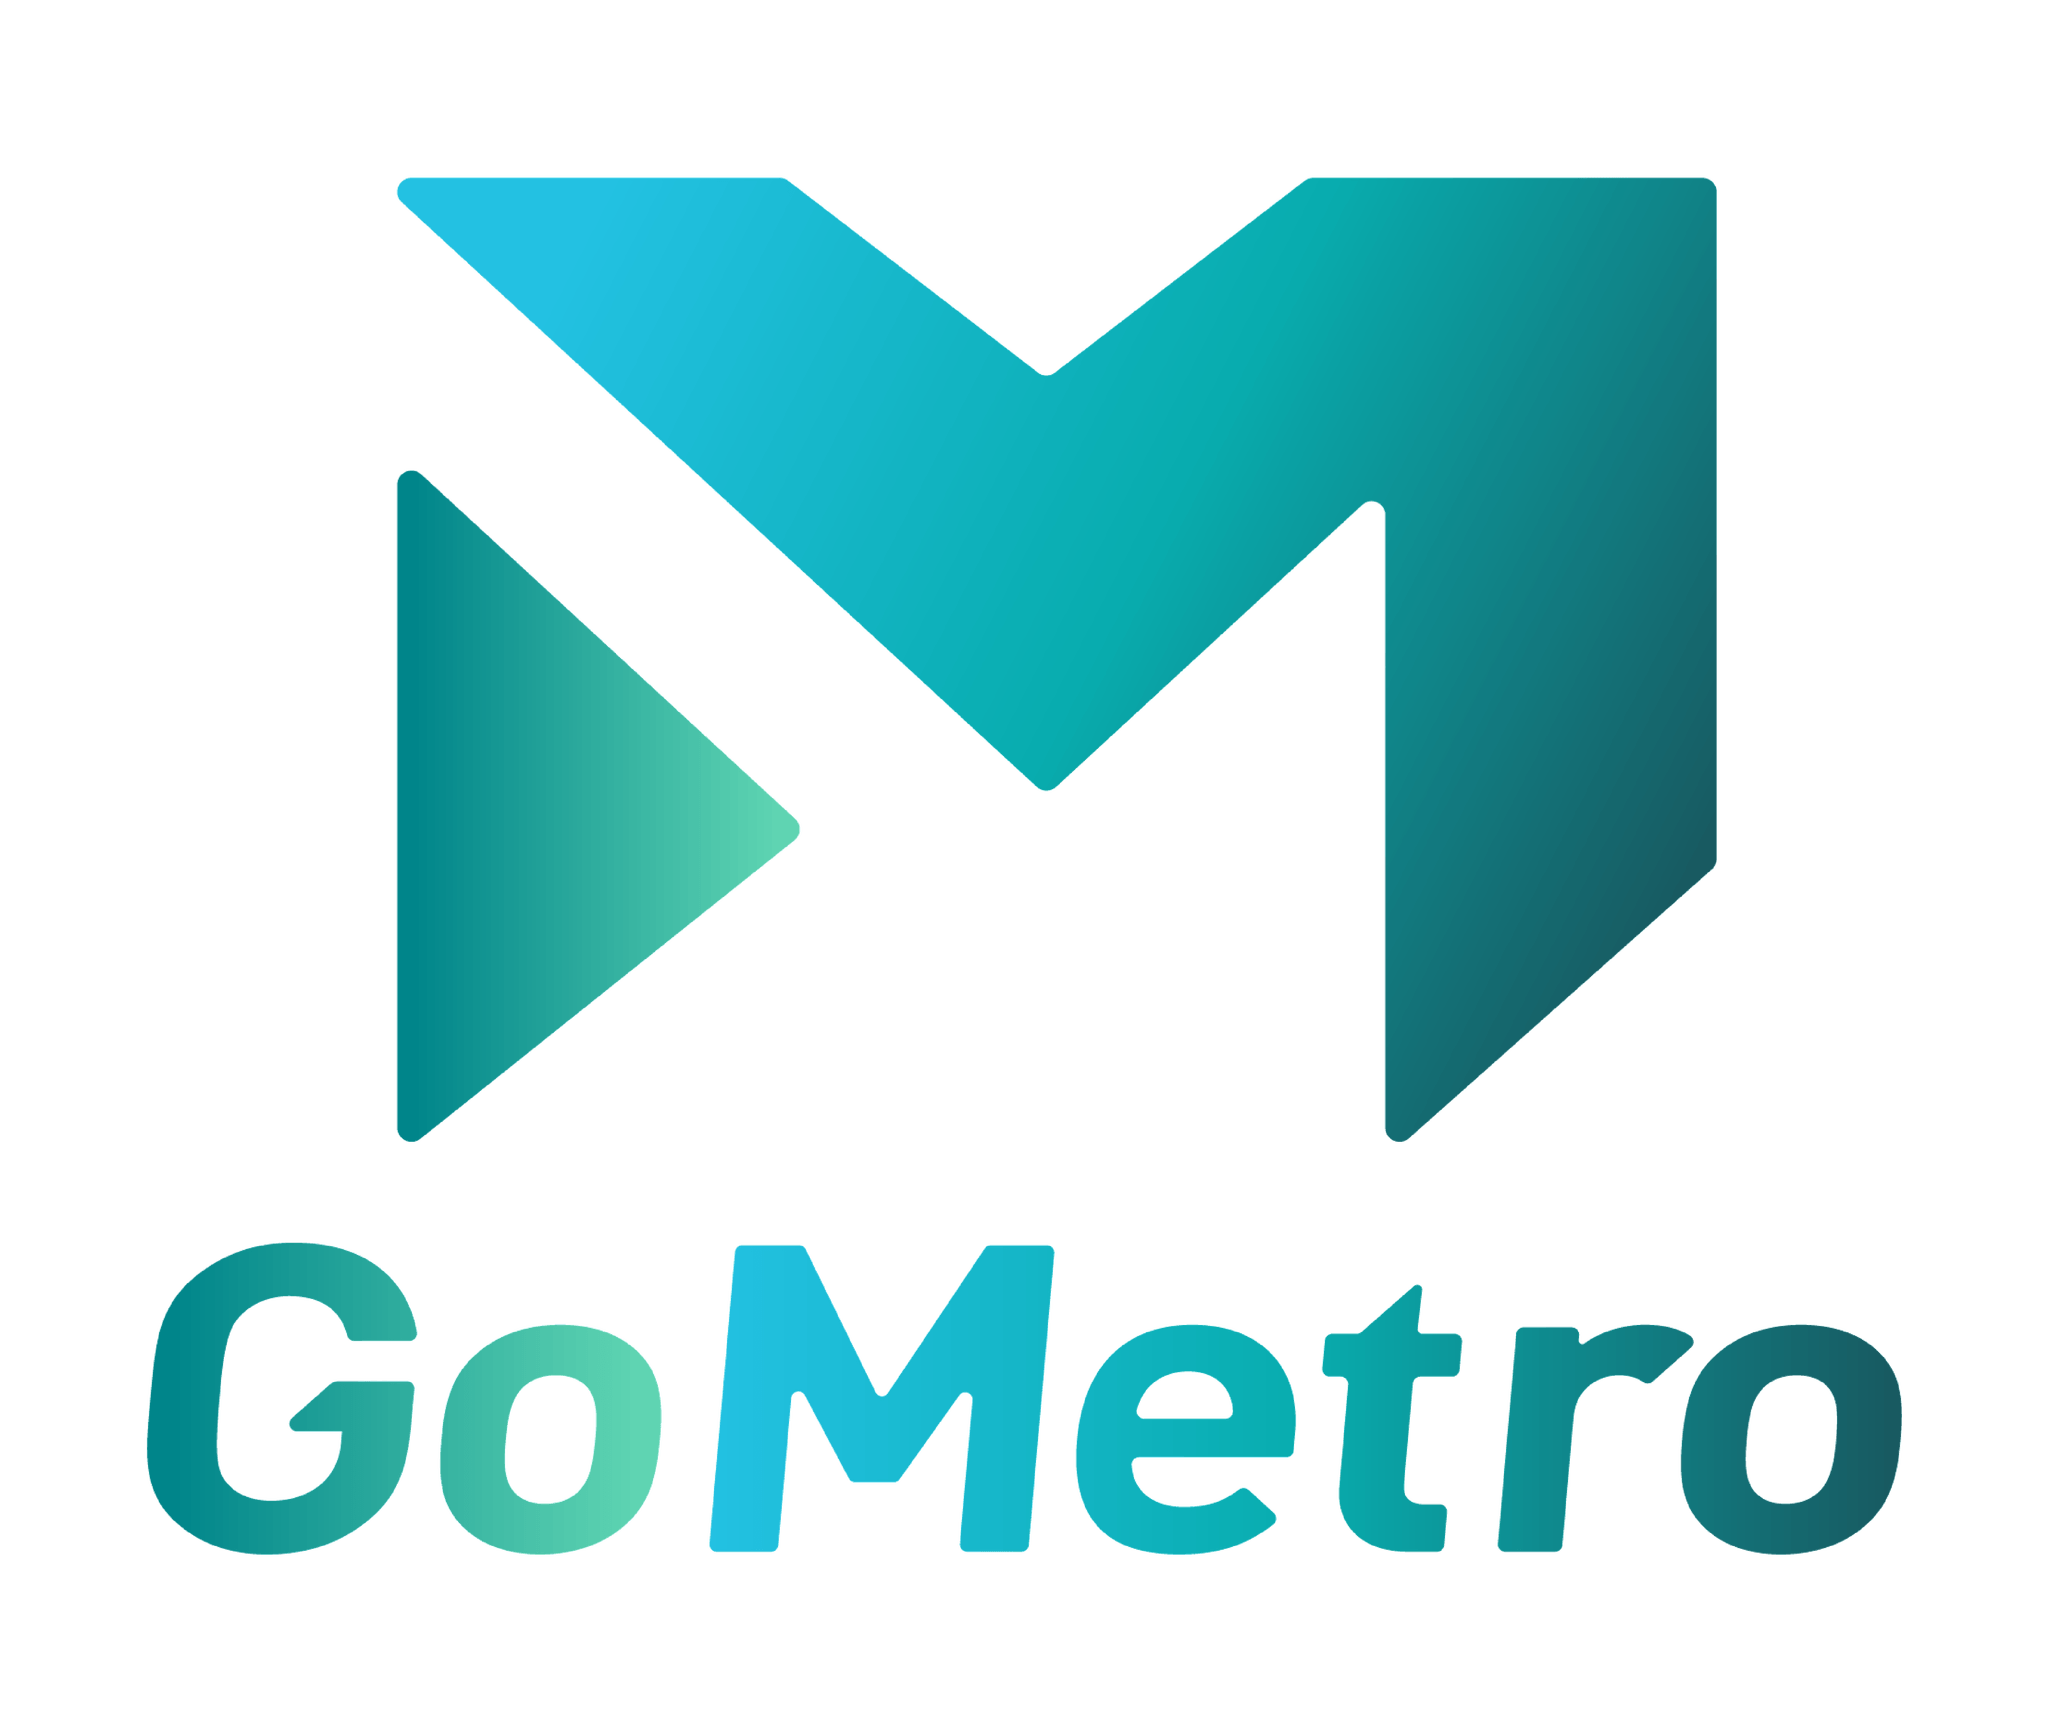 GoMetro (Pty) Ltd - ZA